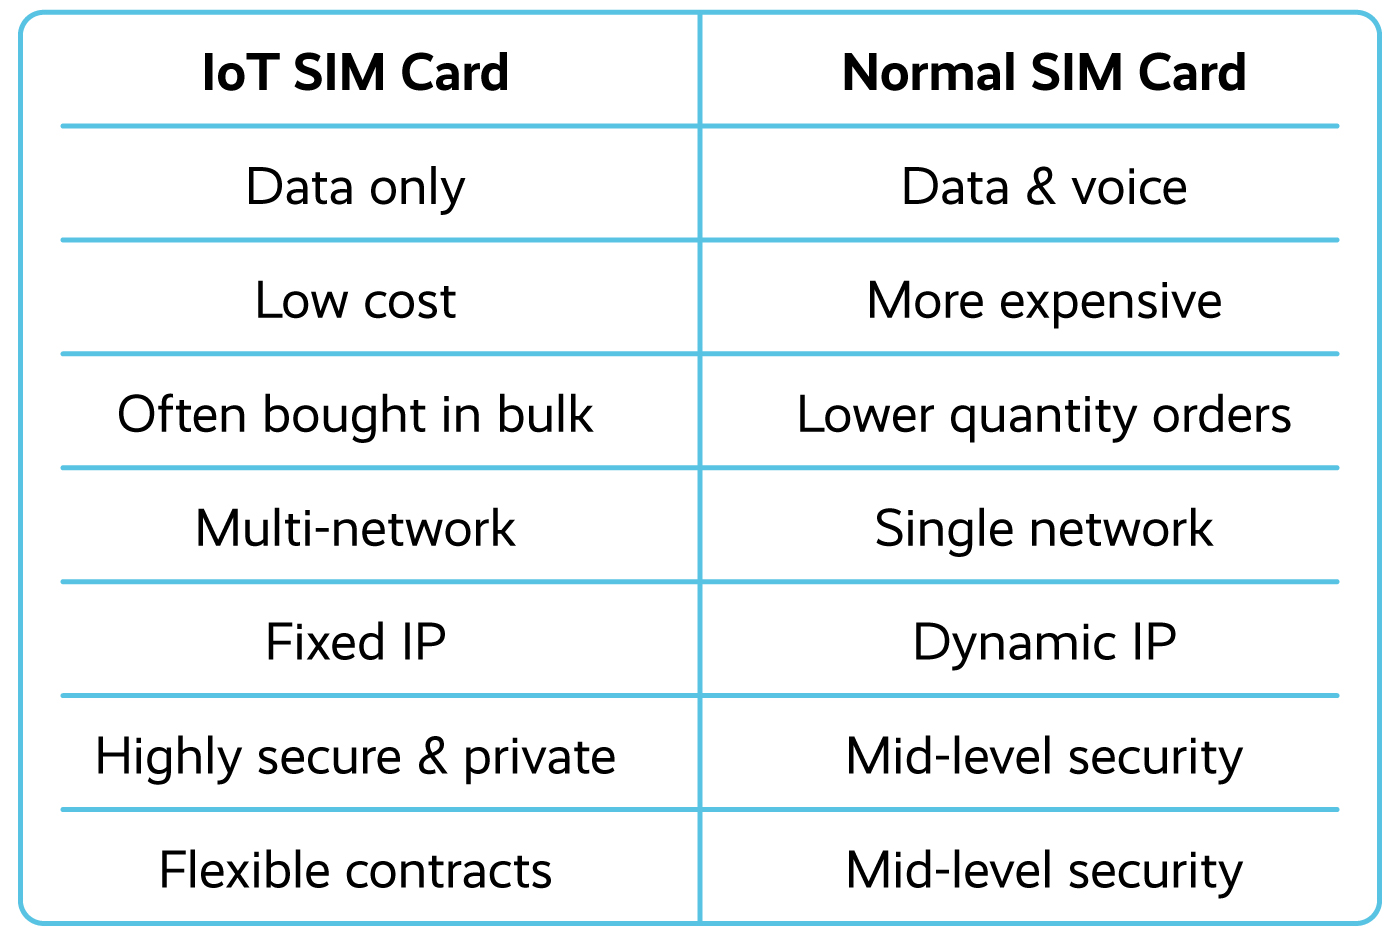 IoT SIM card vs Normal SIM Card comparison